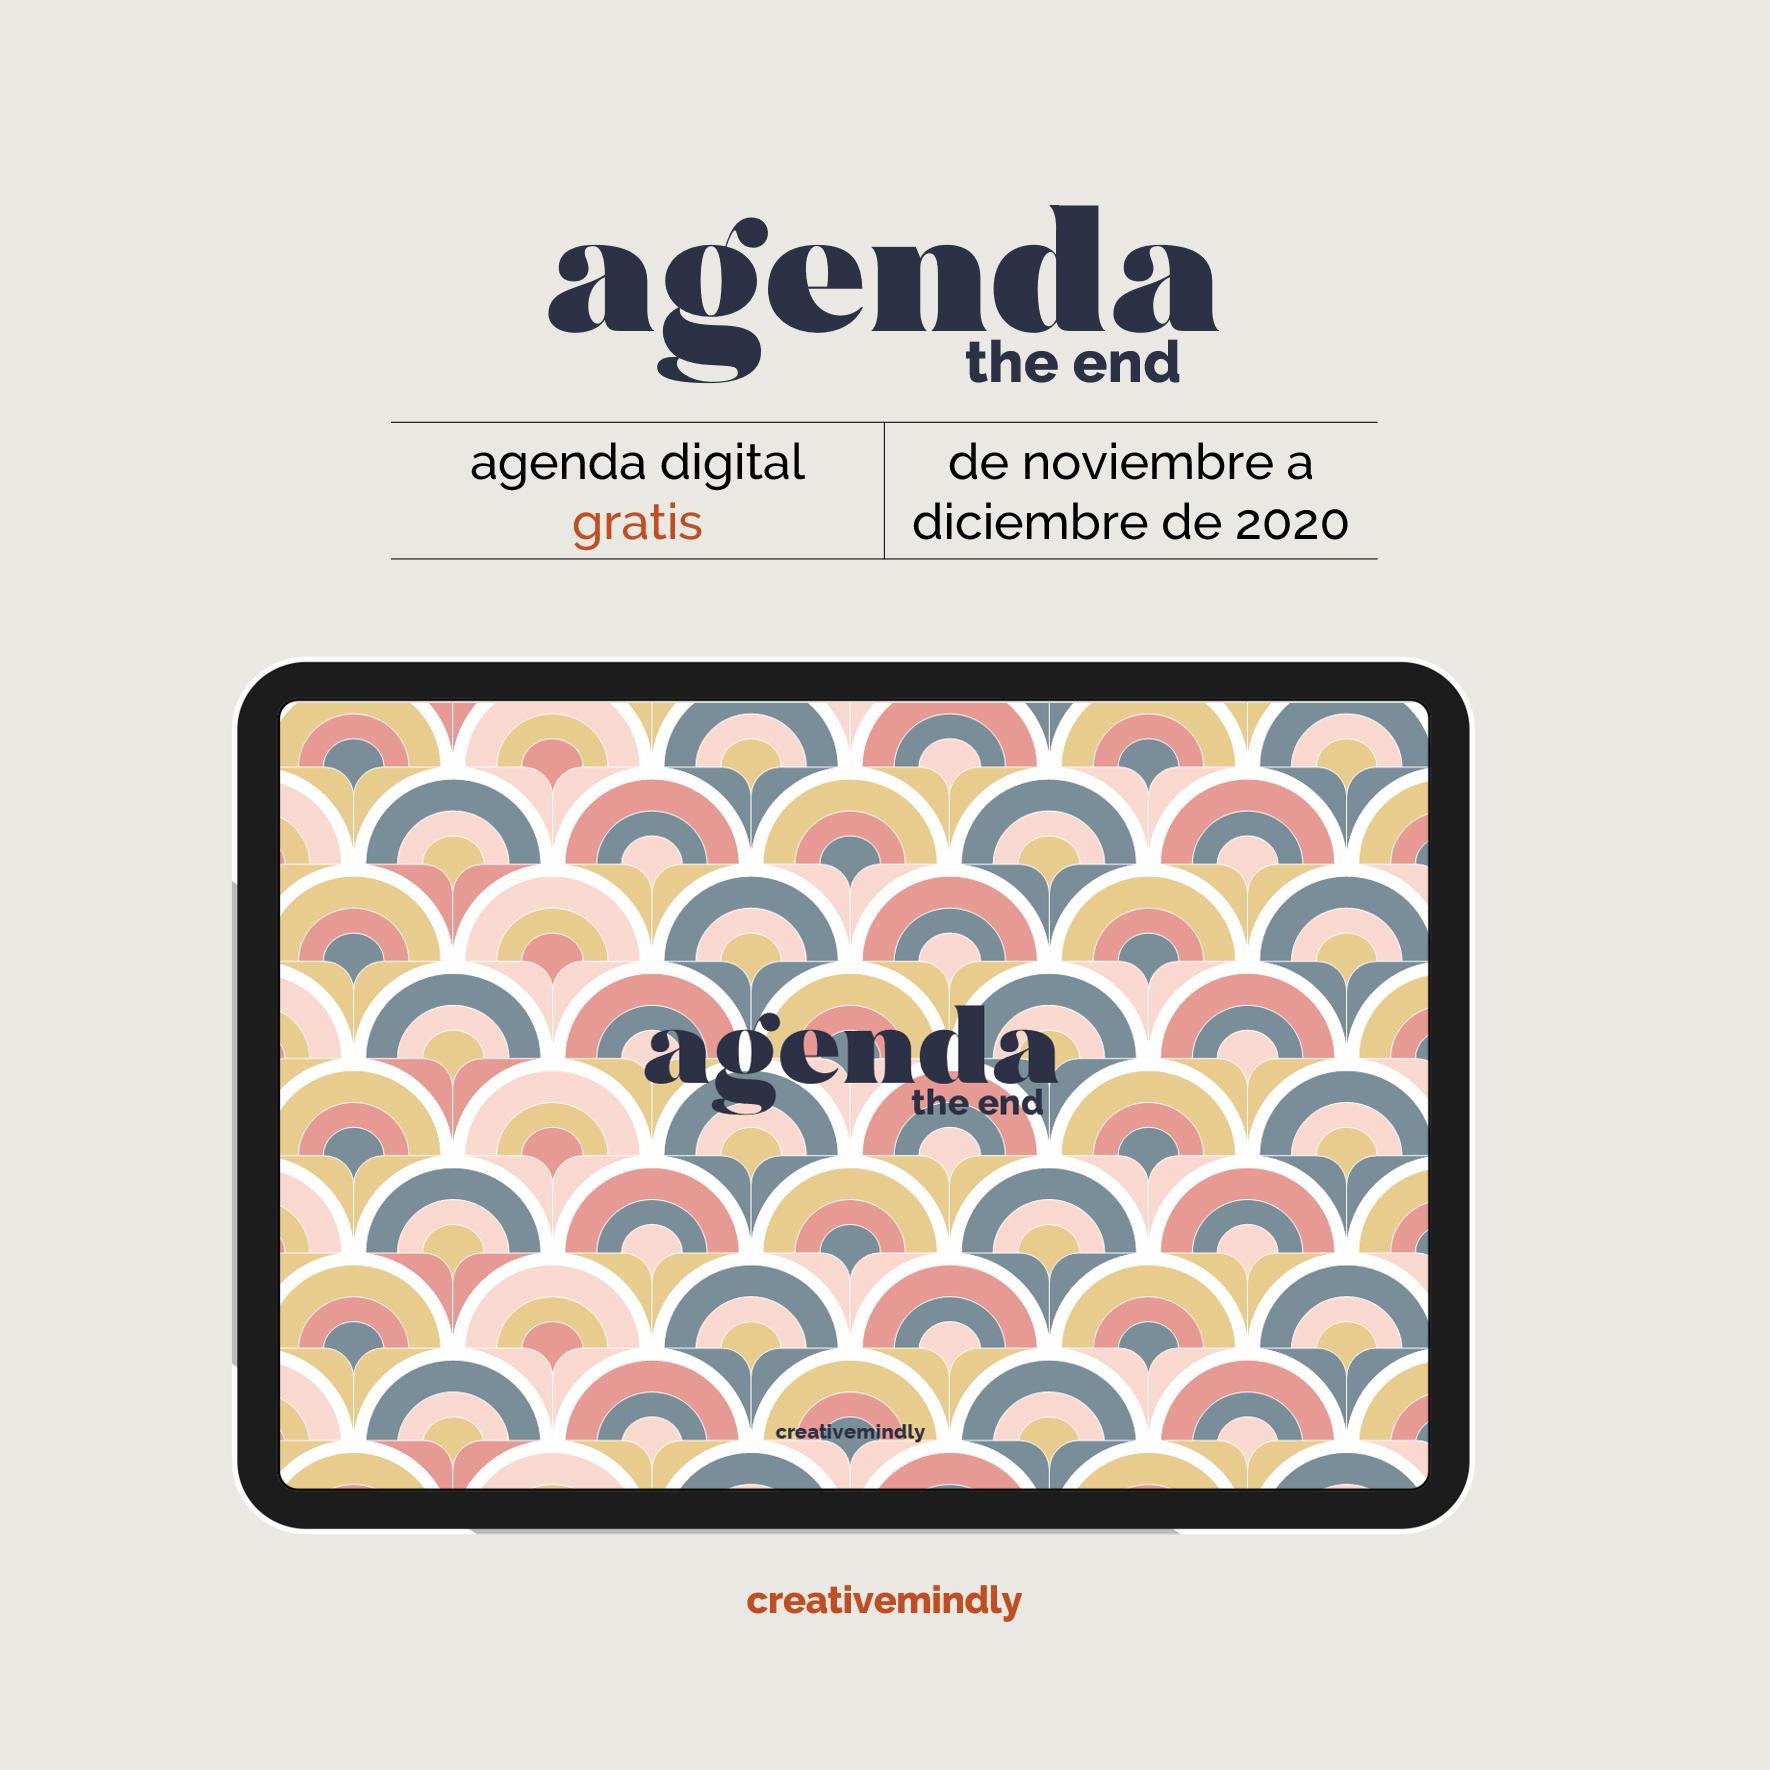 agenda digital ipad android gratis